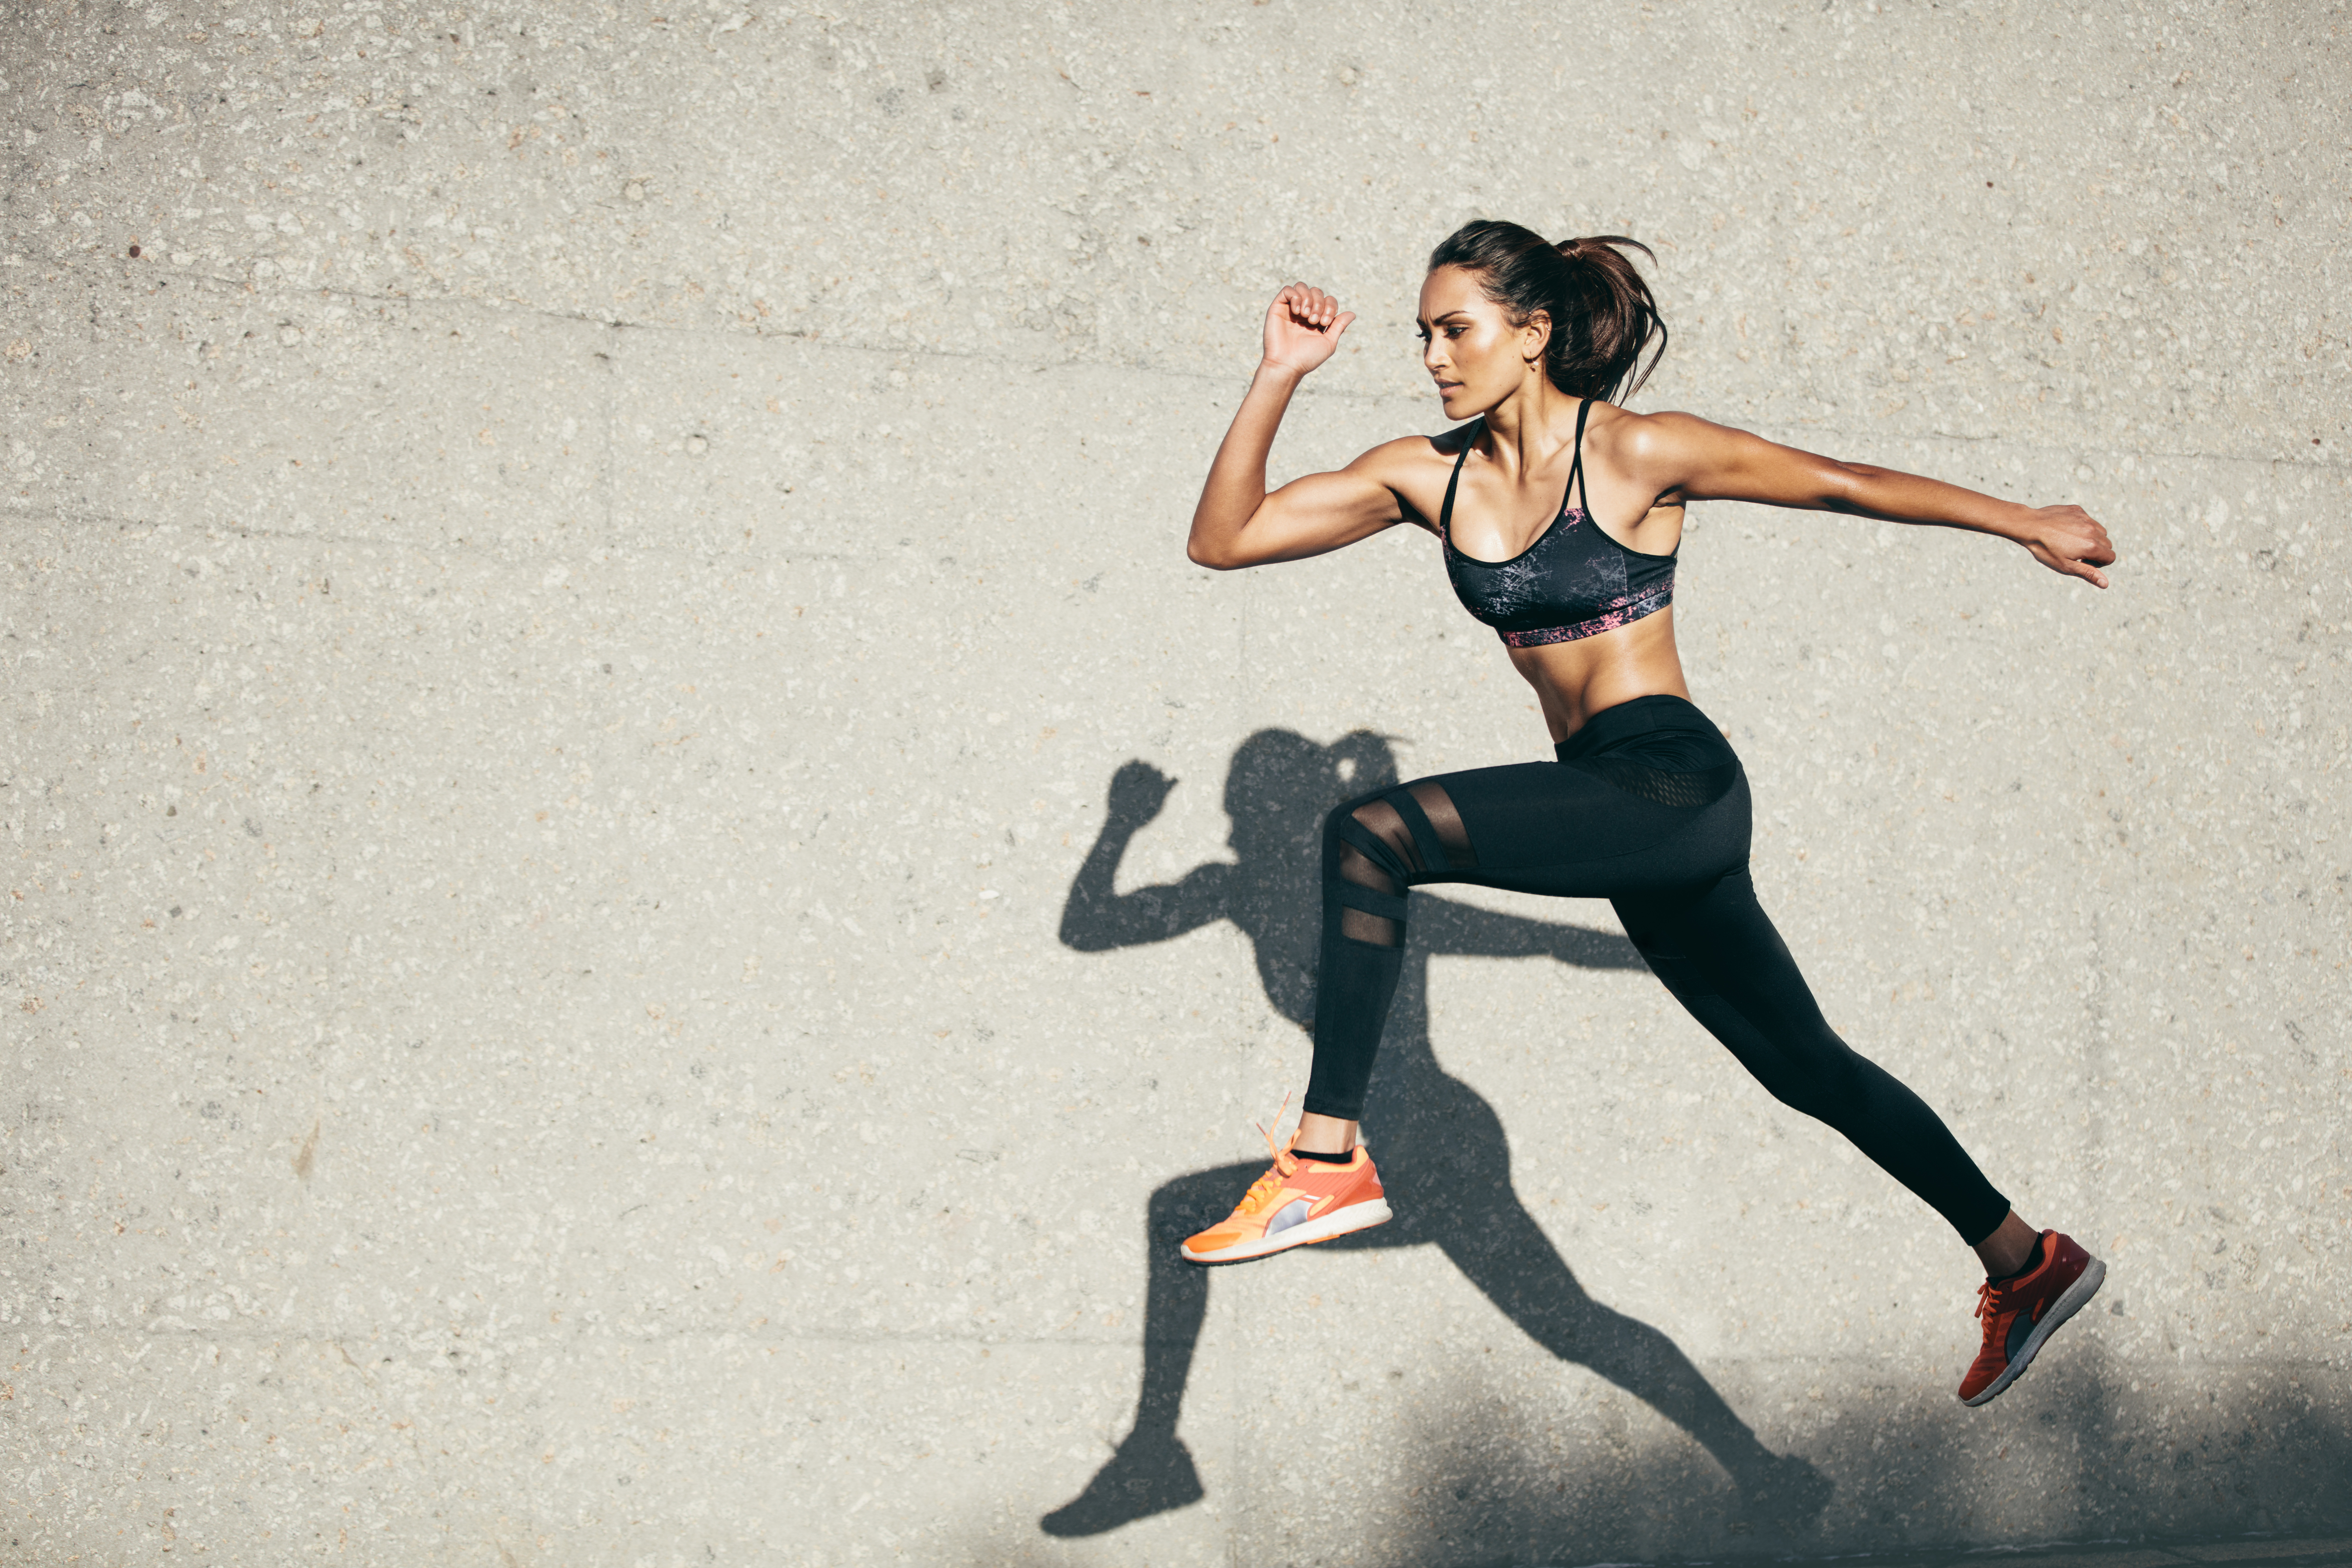 does cardio burn muscle or fat? healthfullyCardio #16